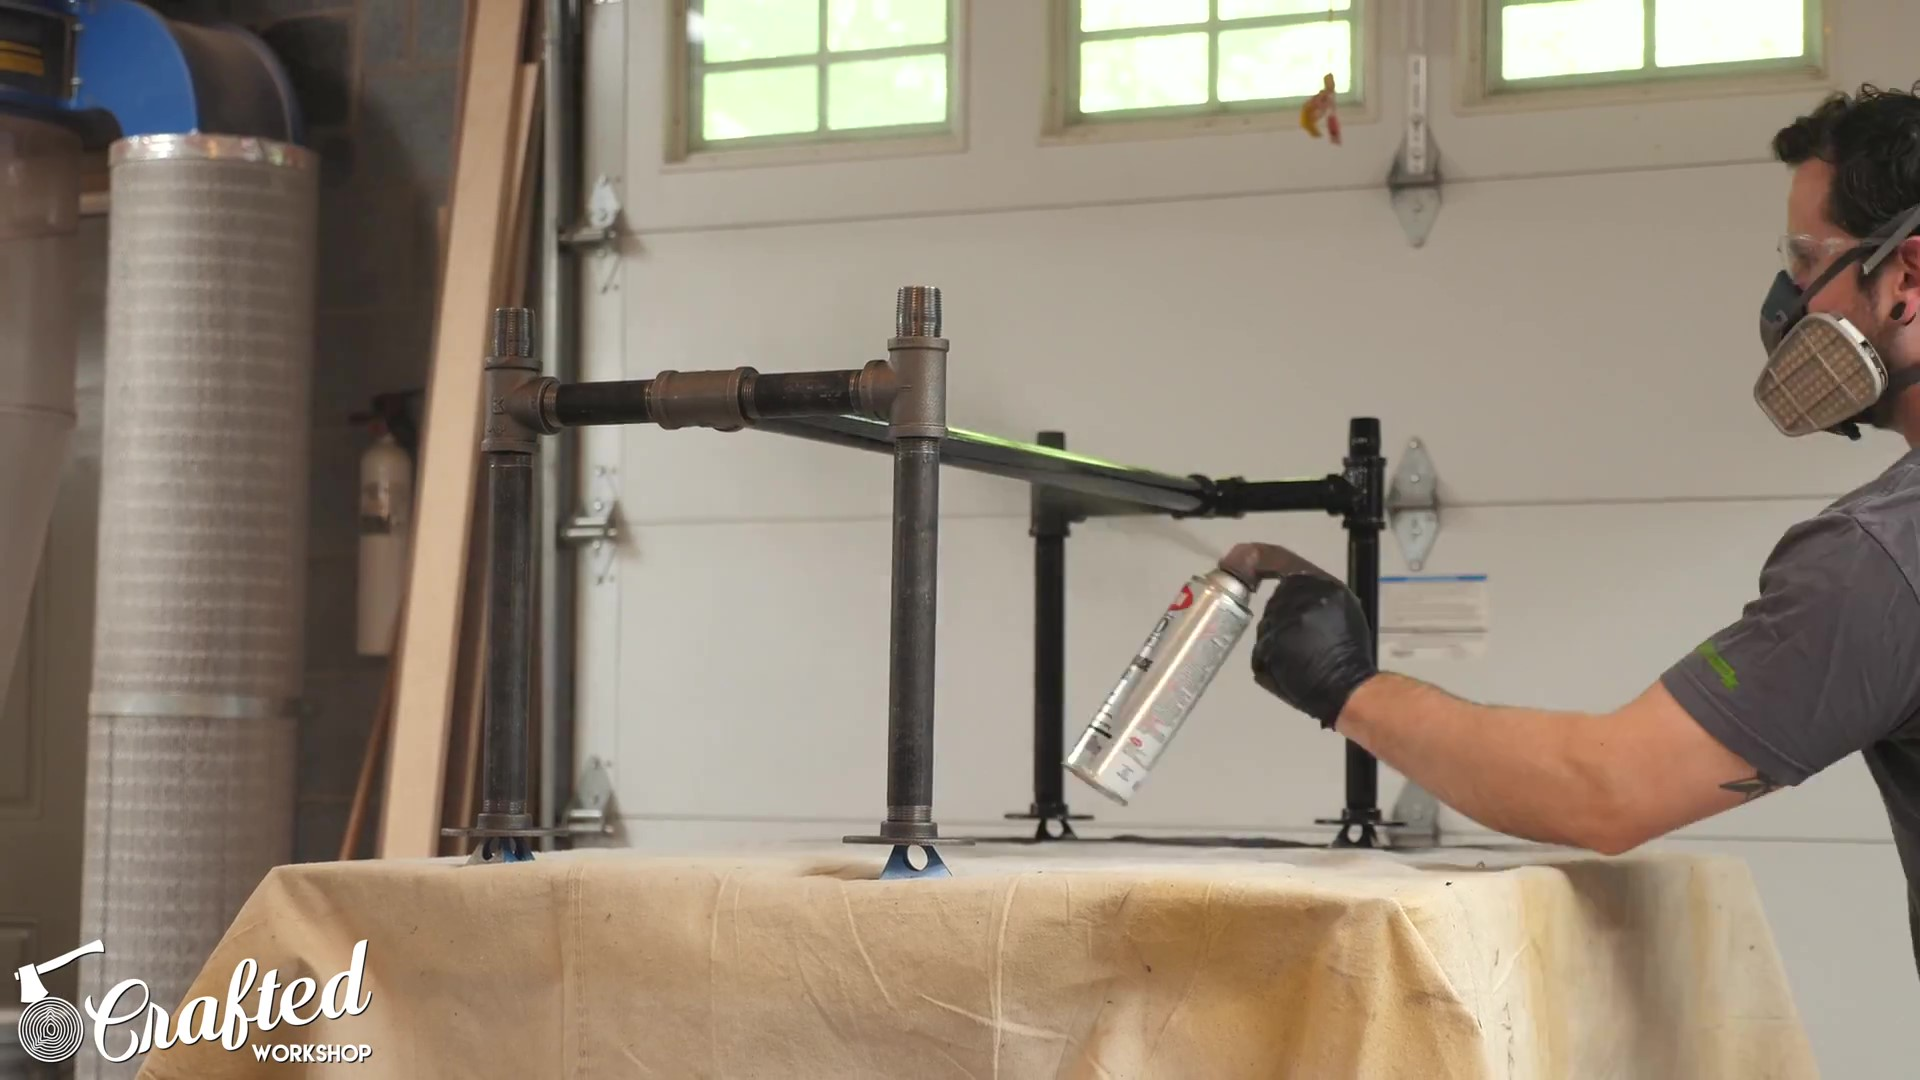 Applying black enamel spray paint